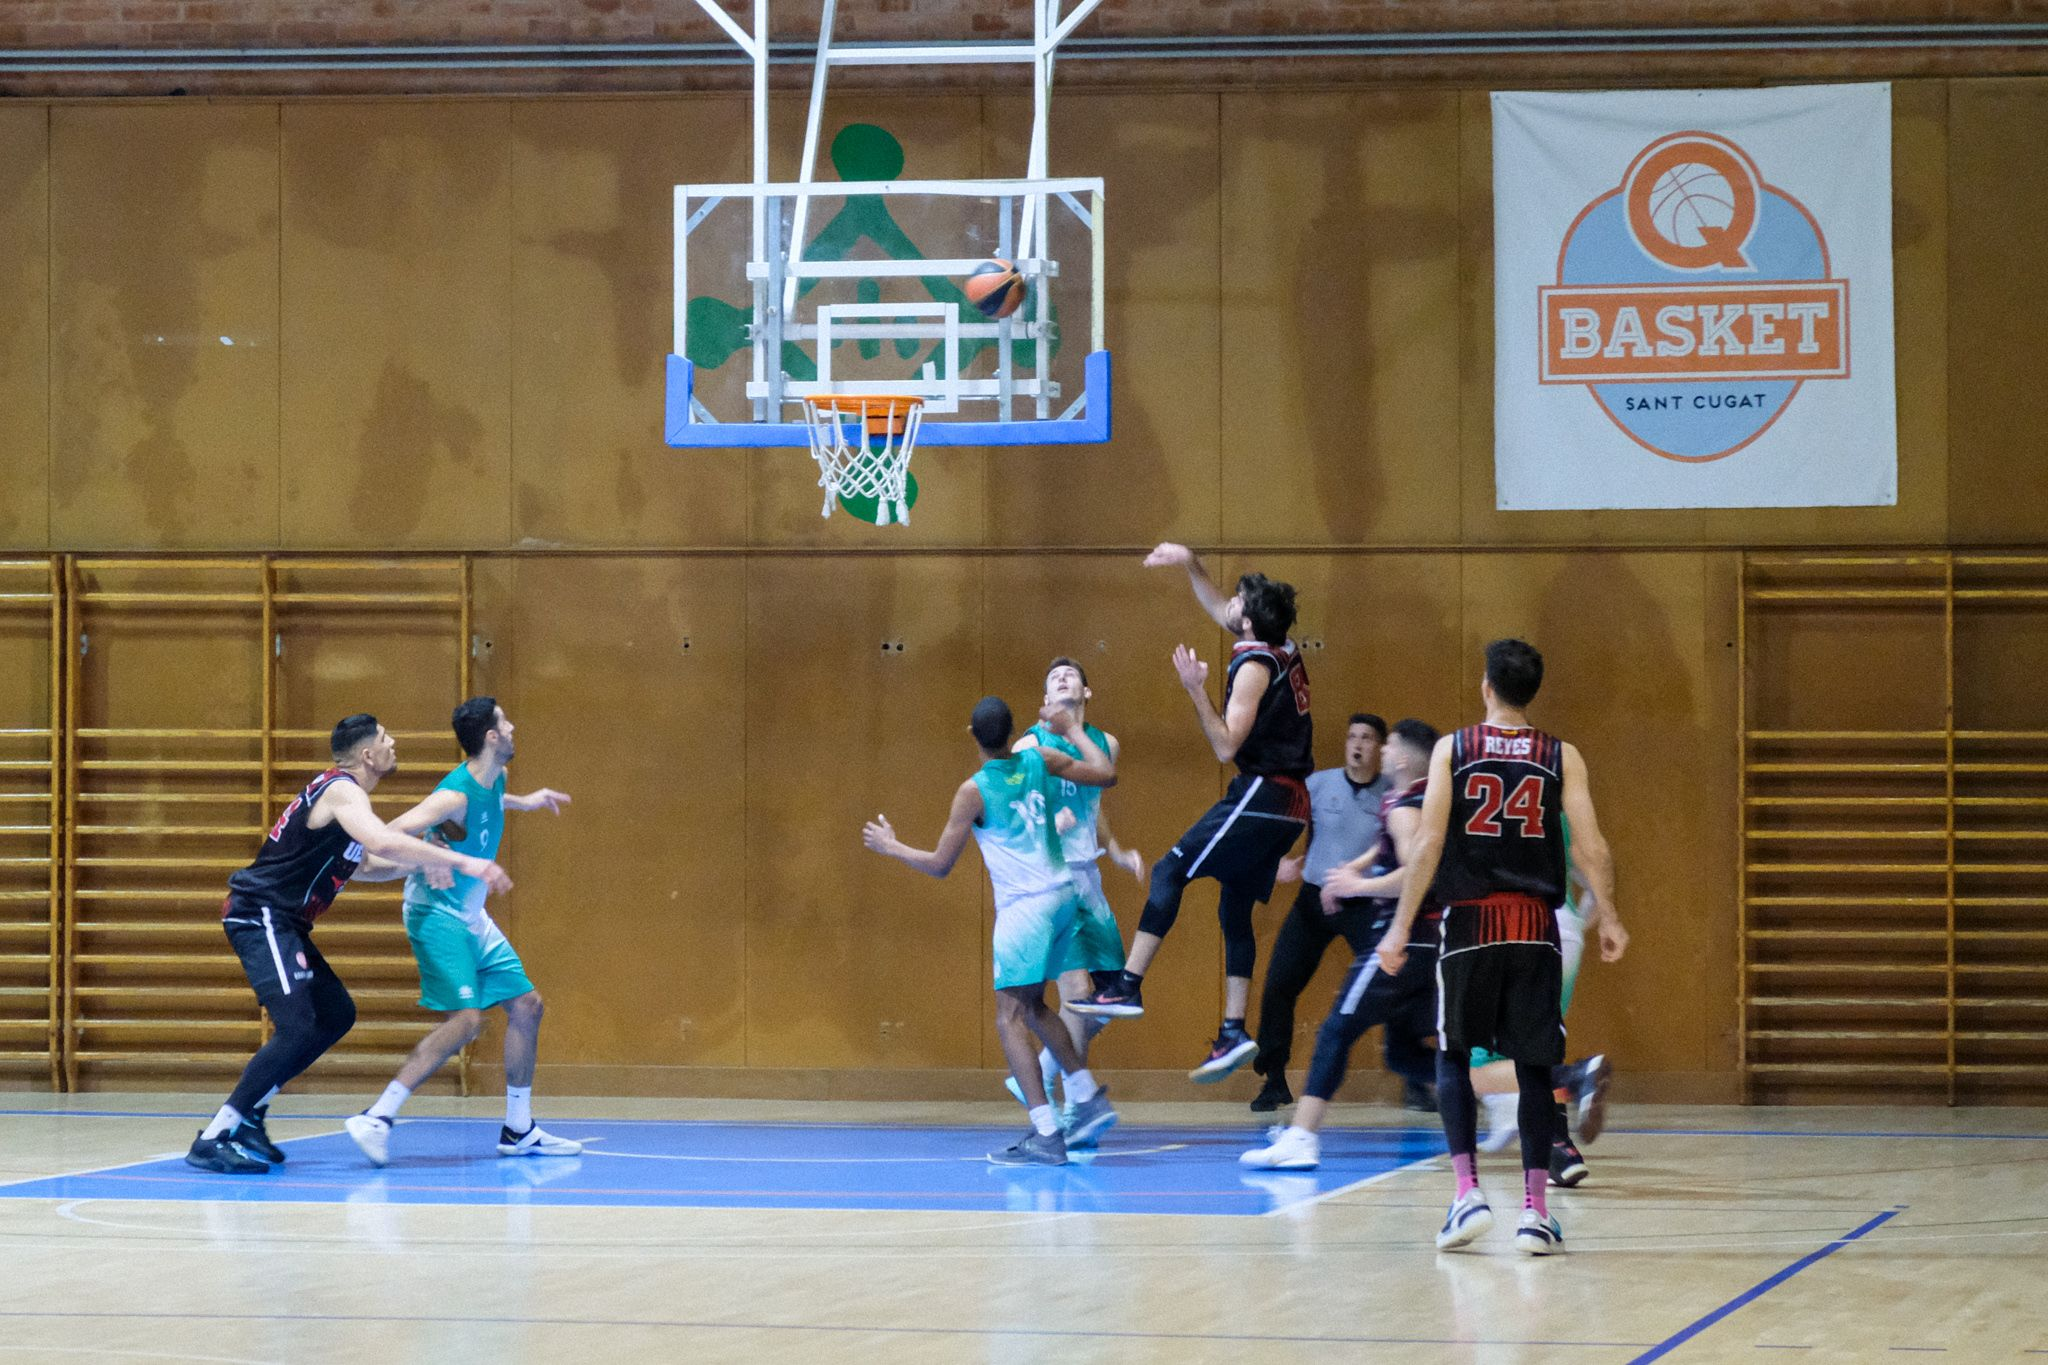 Lliga bàsquet masculí. UE Sant Cugat Centre Catòlic L'Hospitalet. FOTO: Ale Gómez